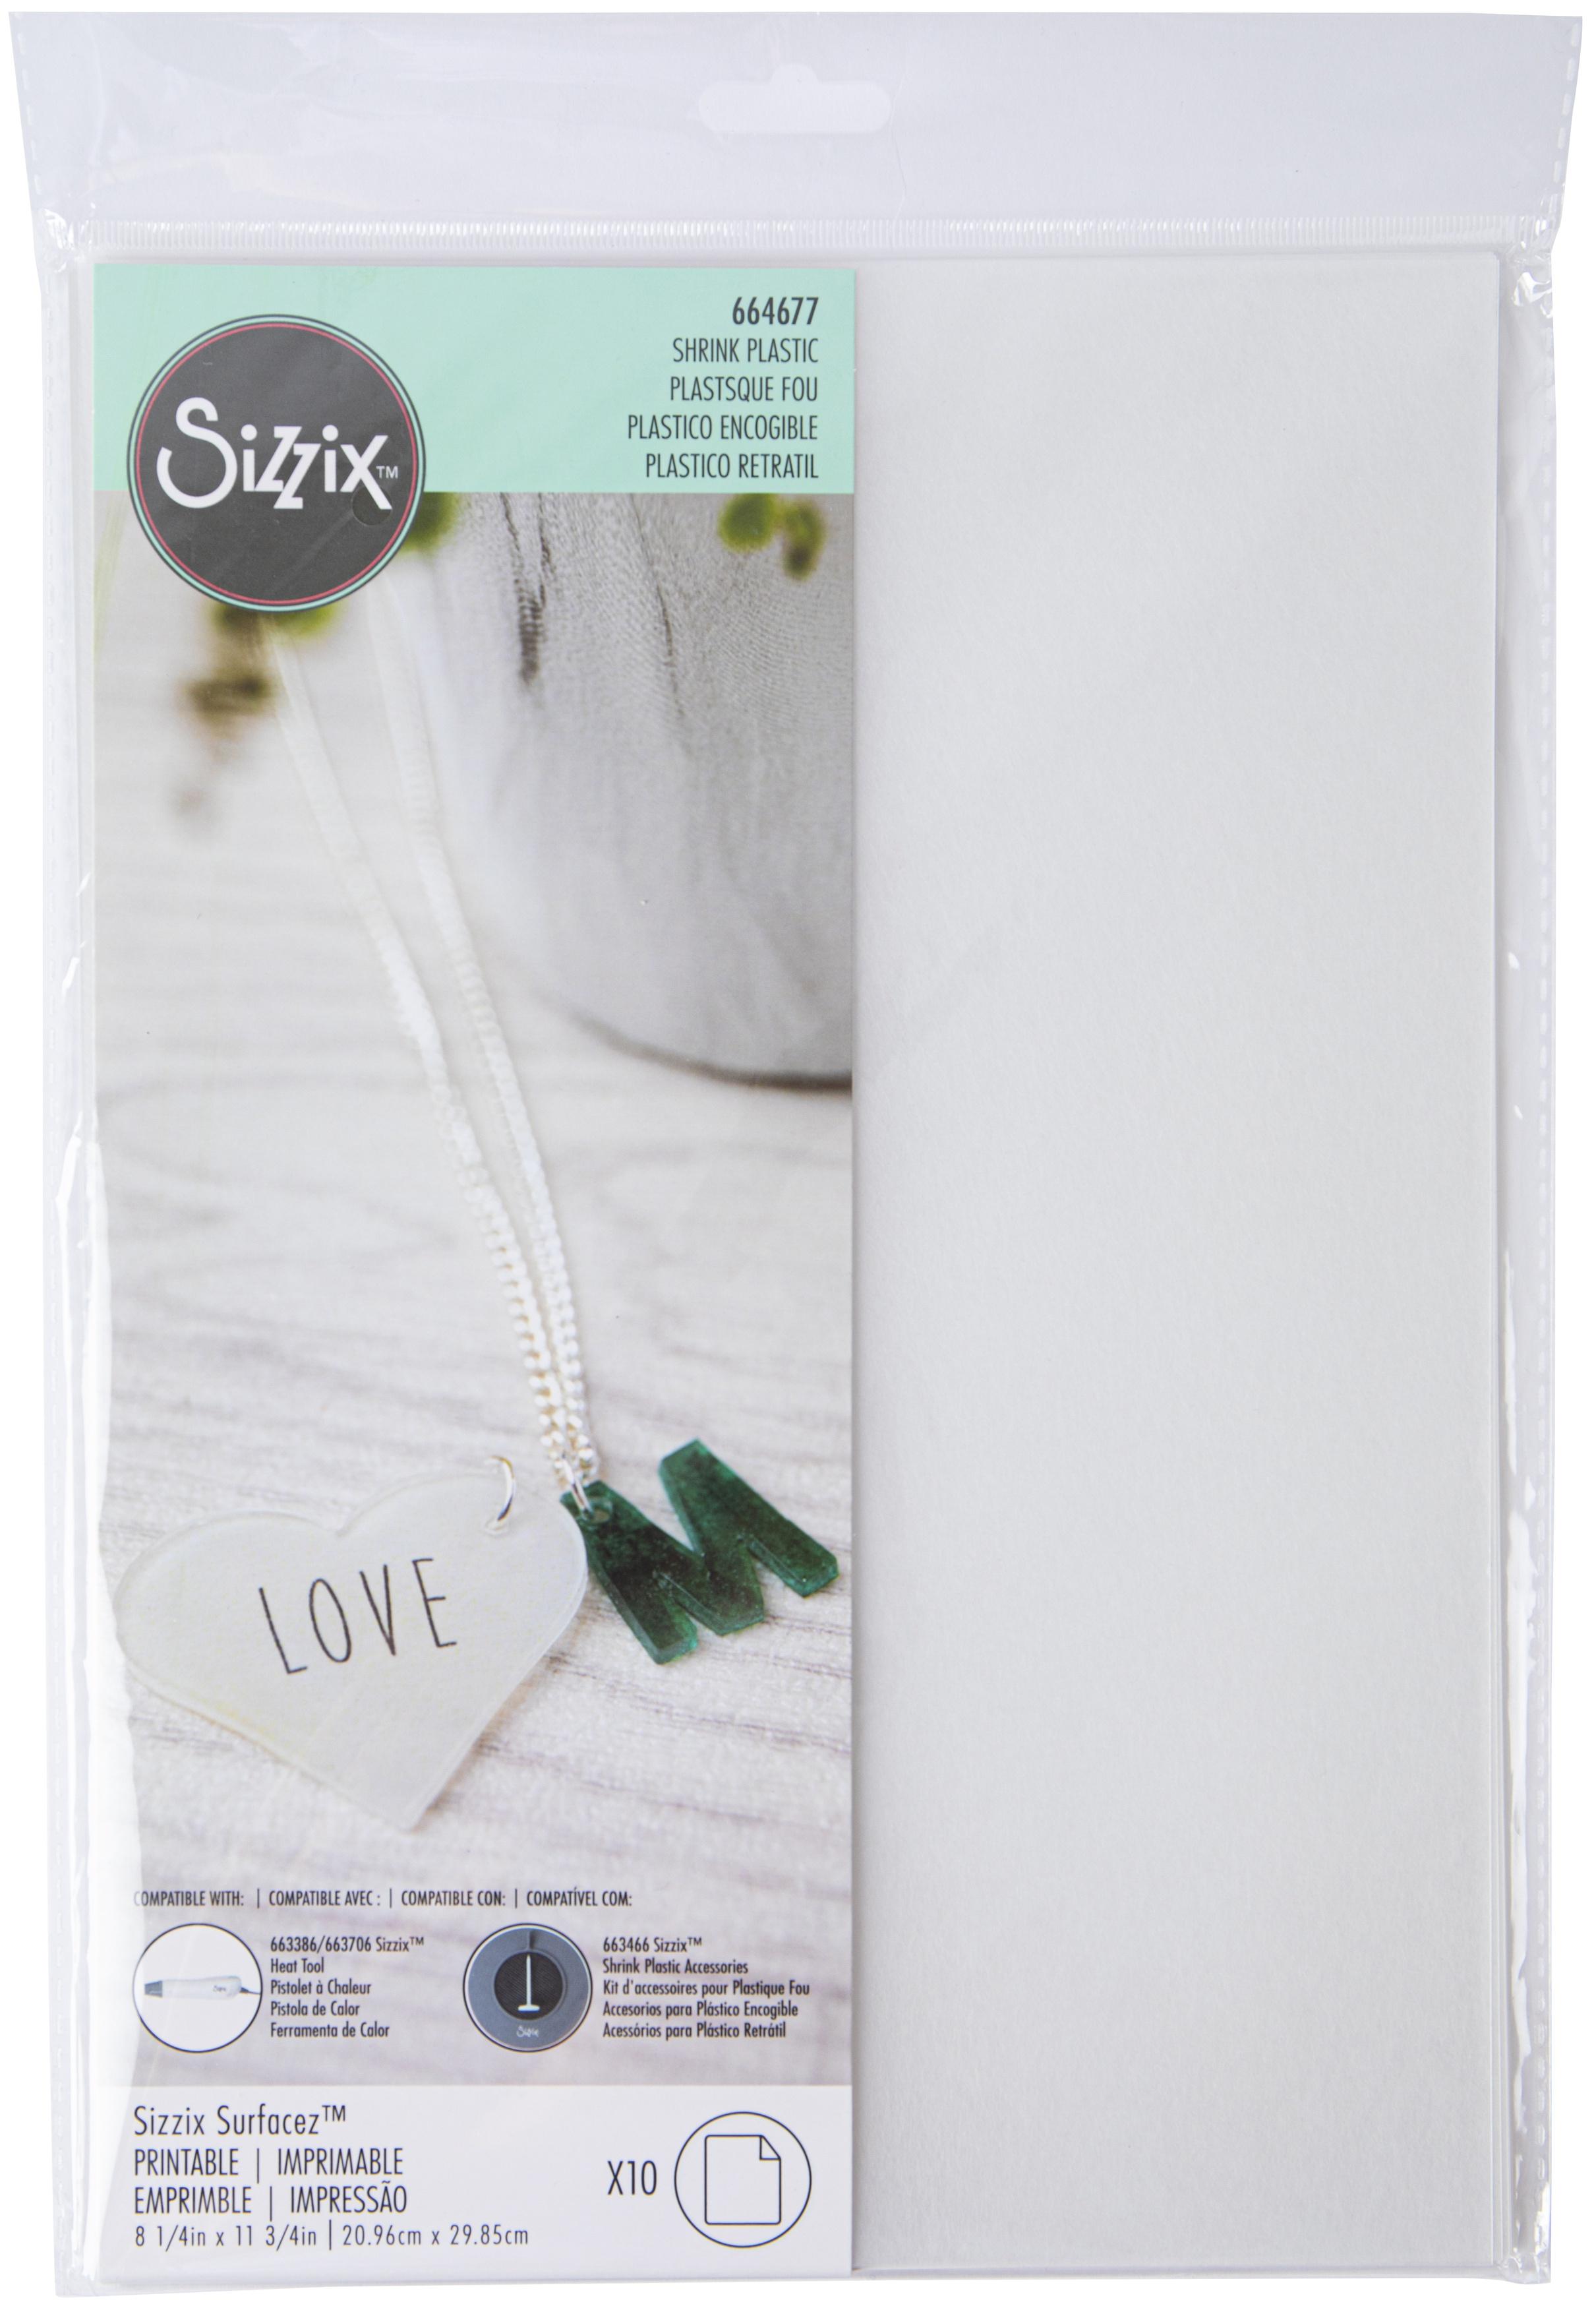 Sizzix Surfacez Shrink Plastic 8.5X11 10/Pkg-Printable